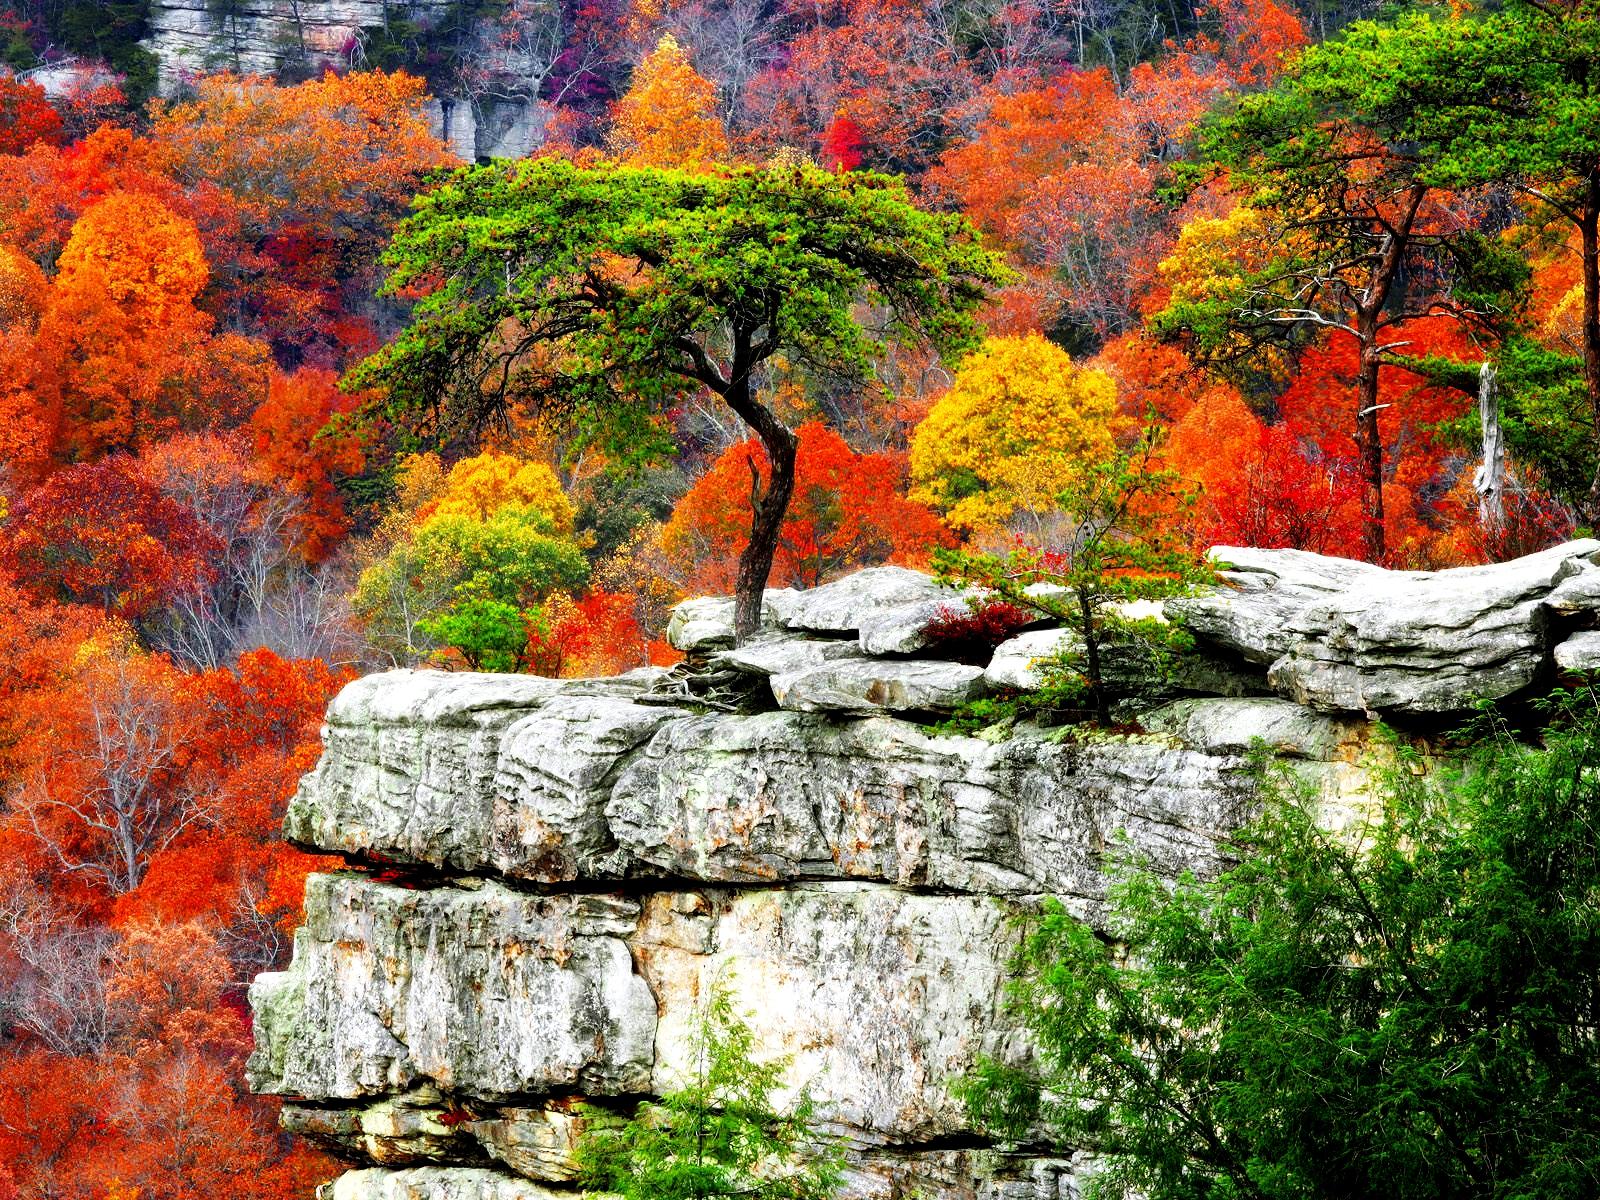 free fall scenery background download. - media file | pixelstalk